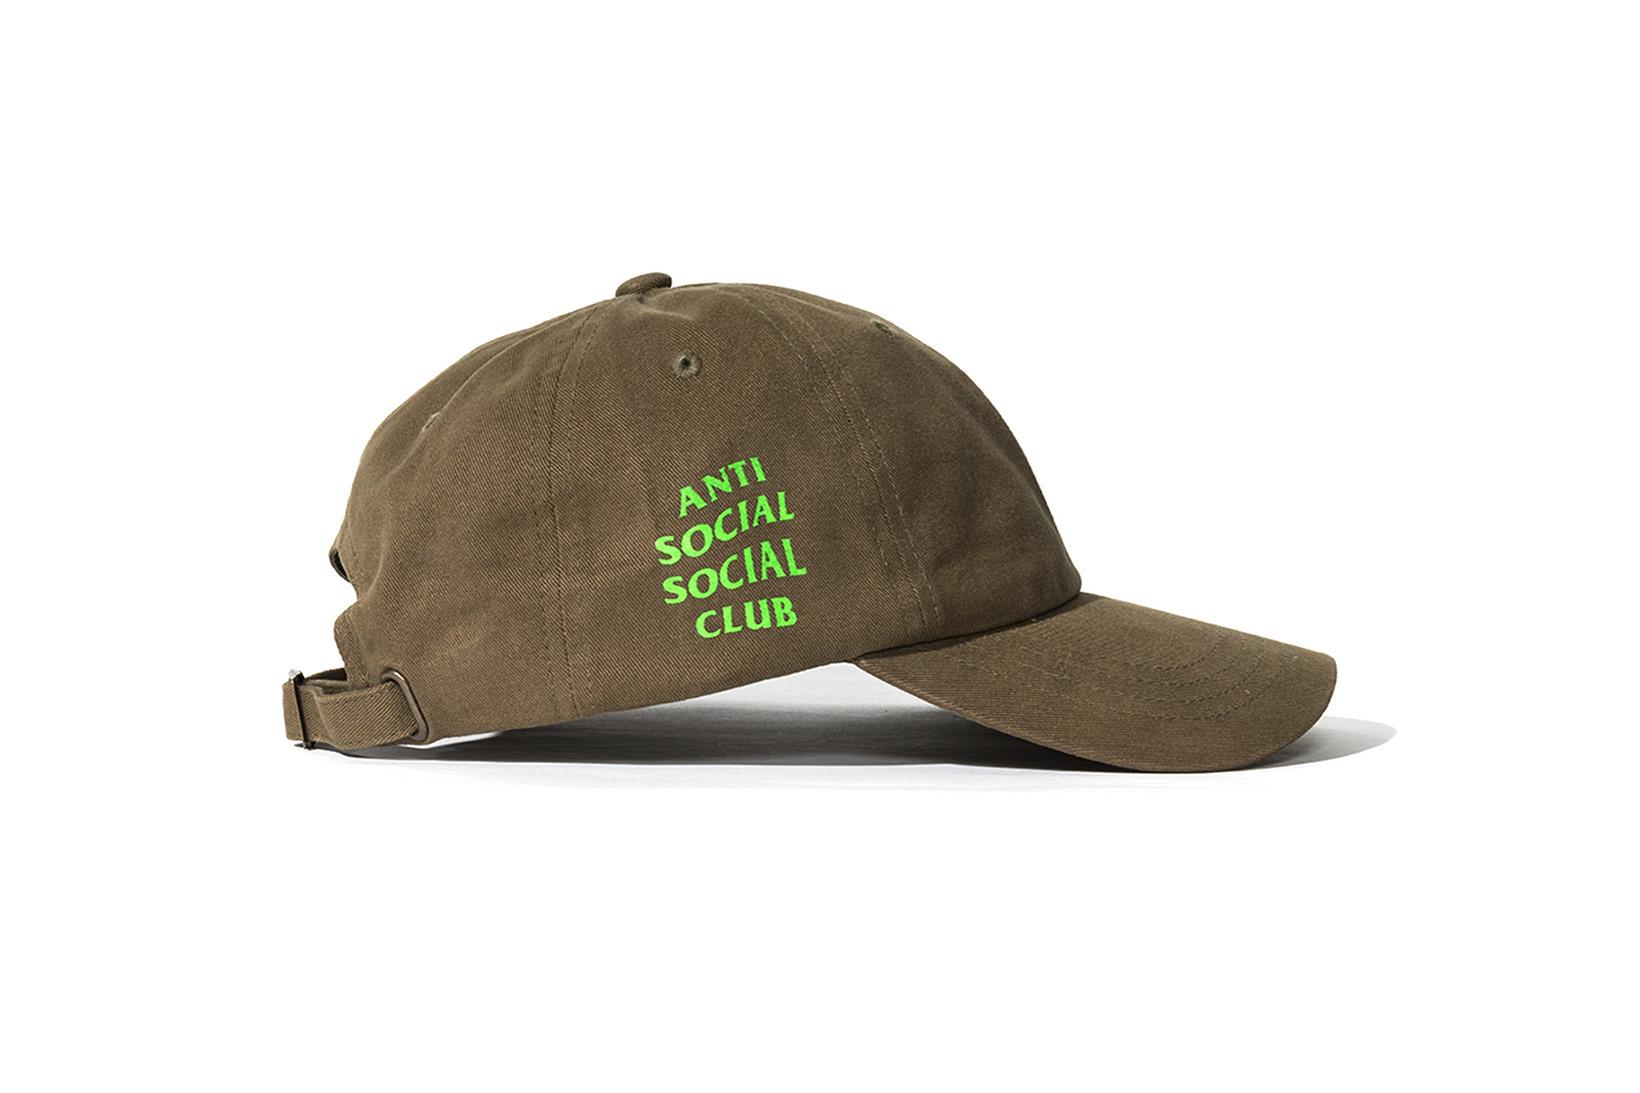 Anti Social Social Club 2017 Spring Summer - 3744379